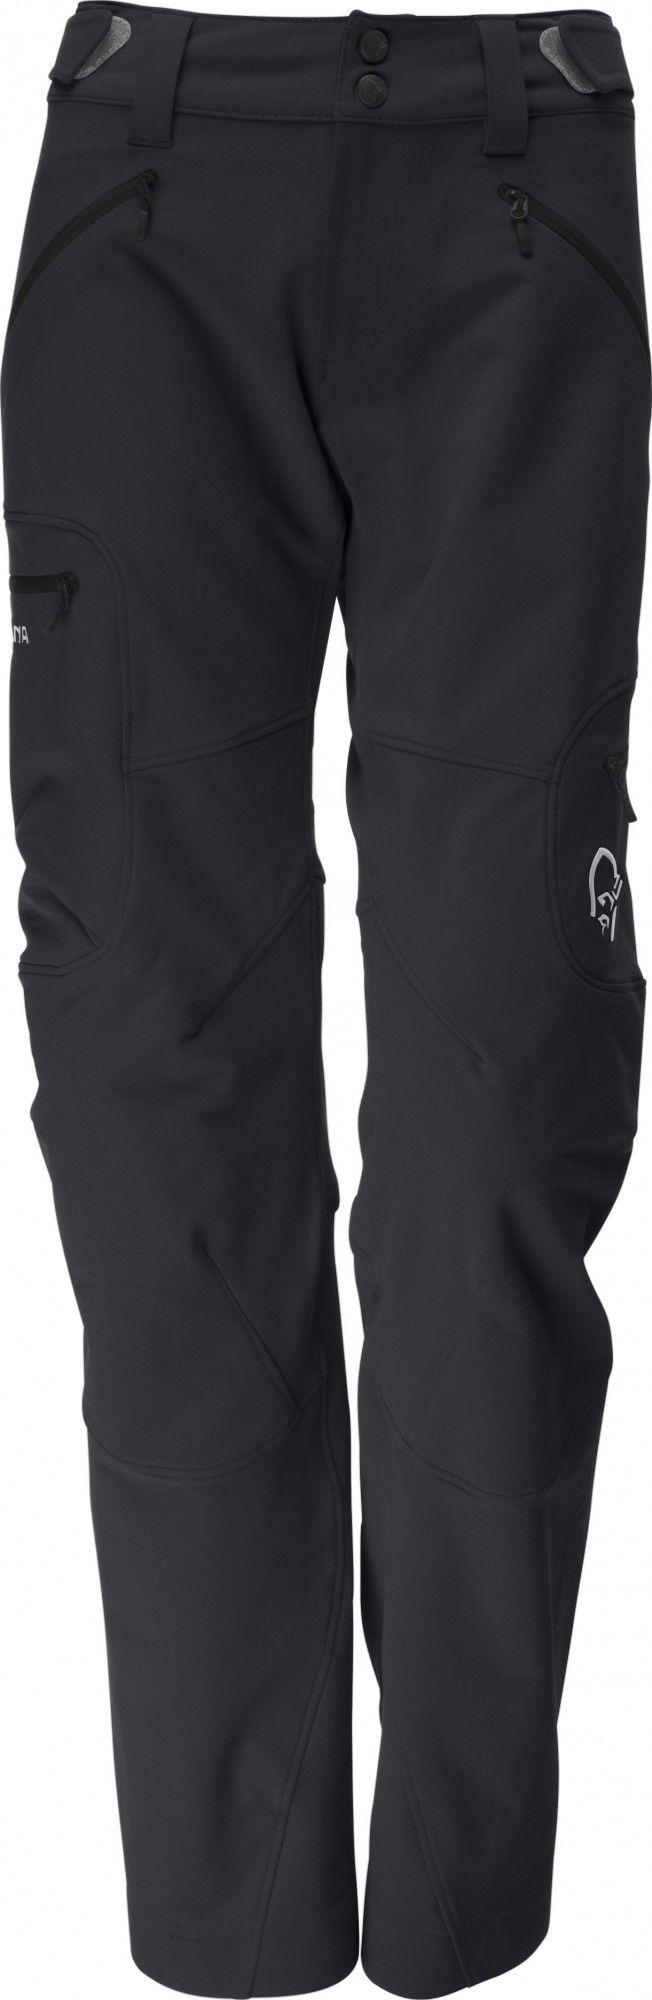 Norrona Svalbard Flex1 Pants Schwarz, Female Hose, L